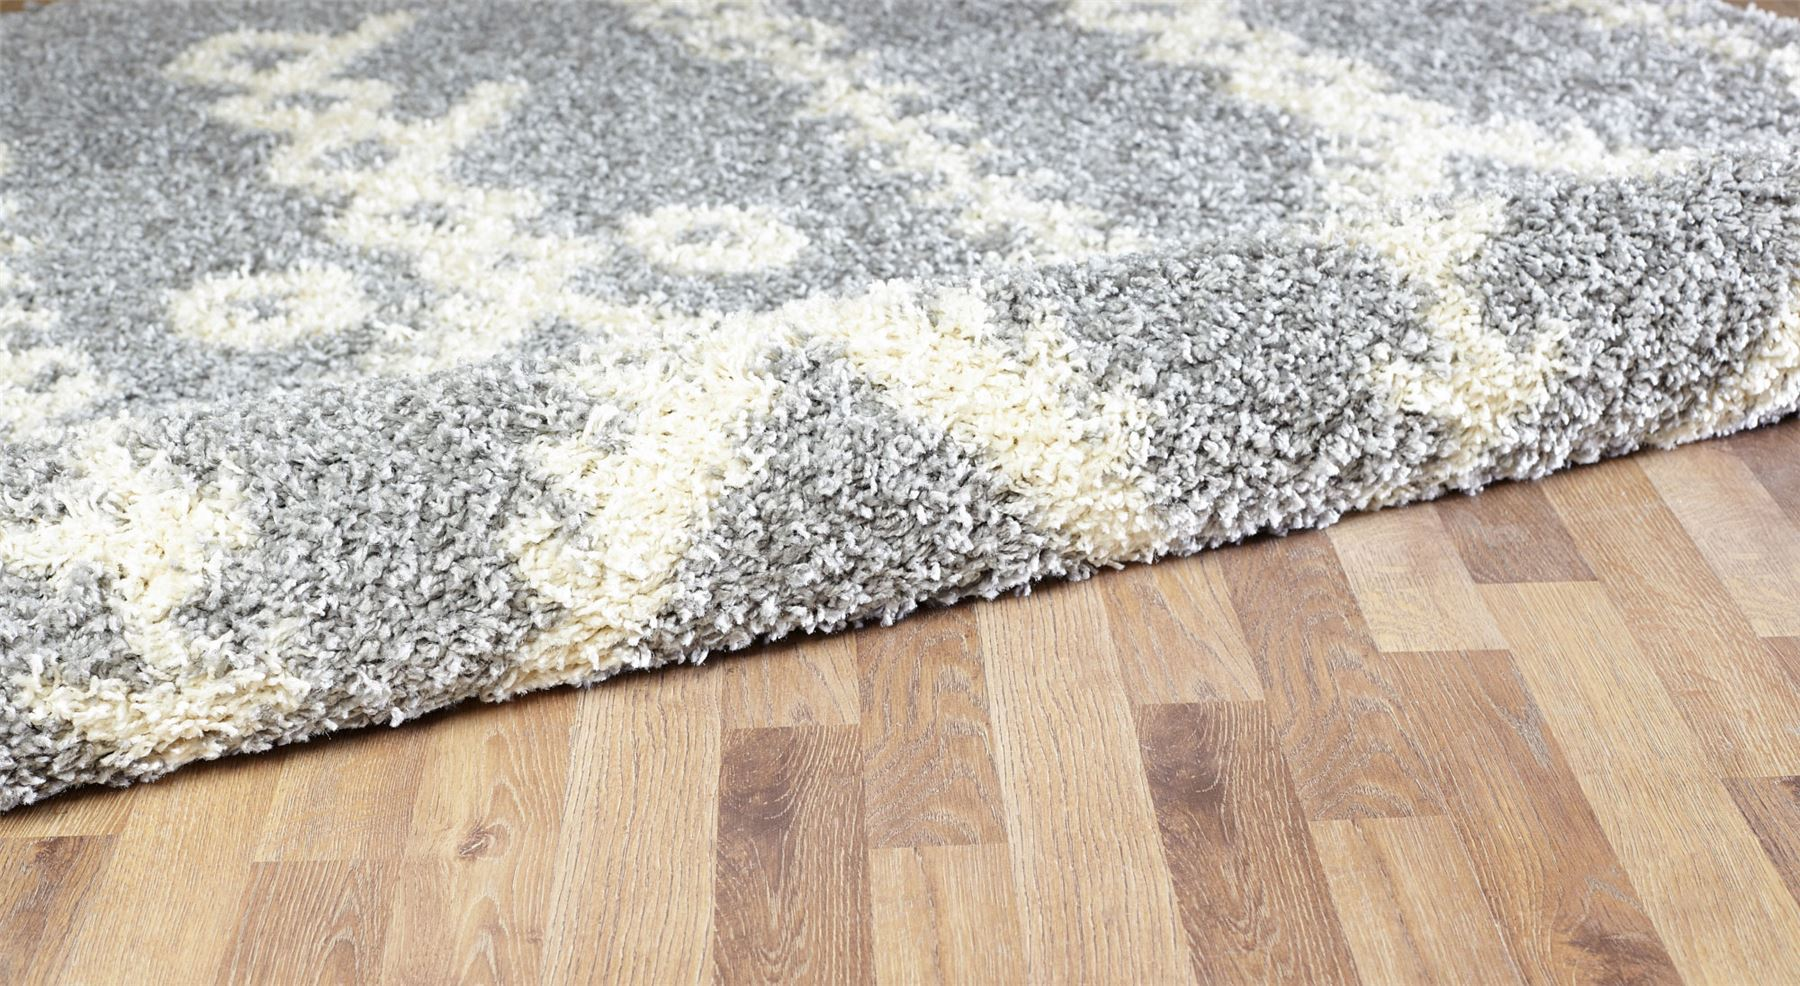 Moroccan-Shaggy-Area-Rug-Grey-White-Black-Soft-Carpet-Traditional-Berber-Designs thumbnail 26